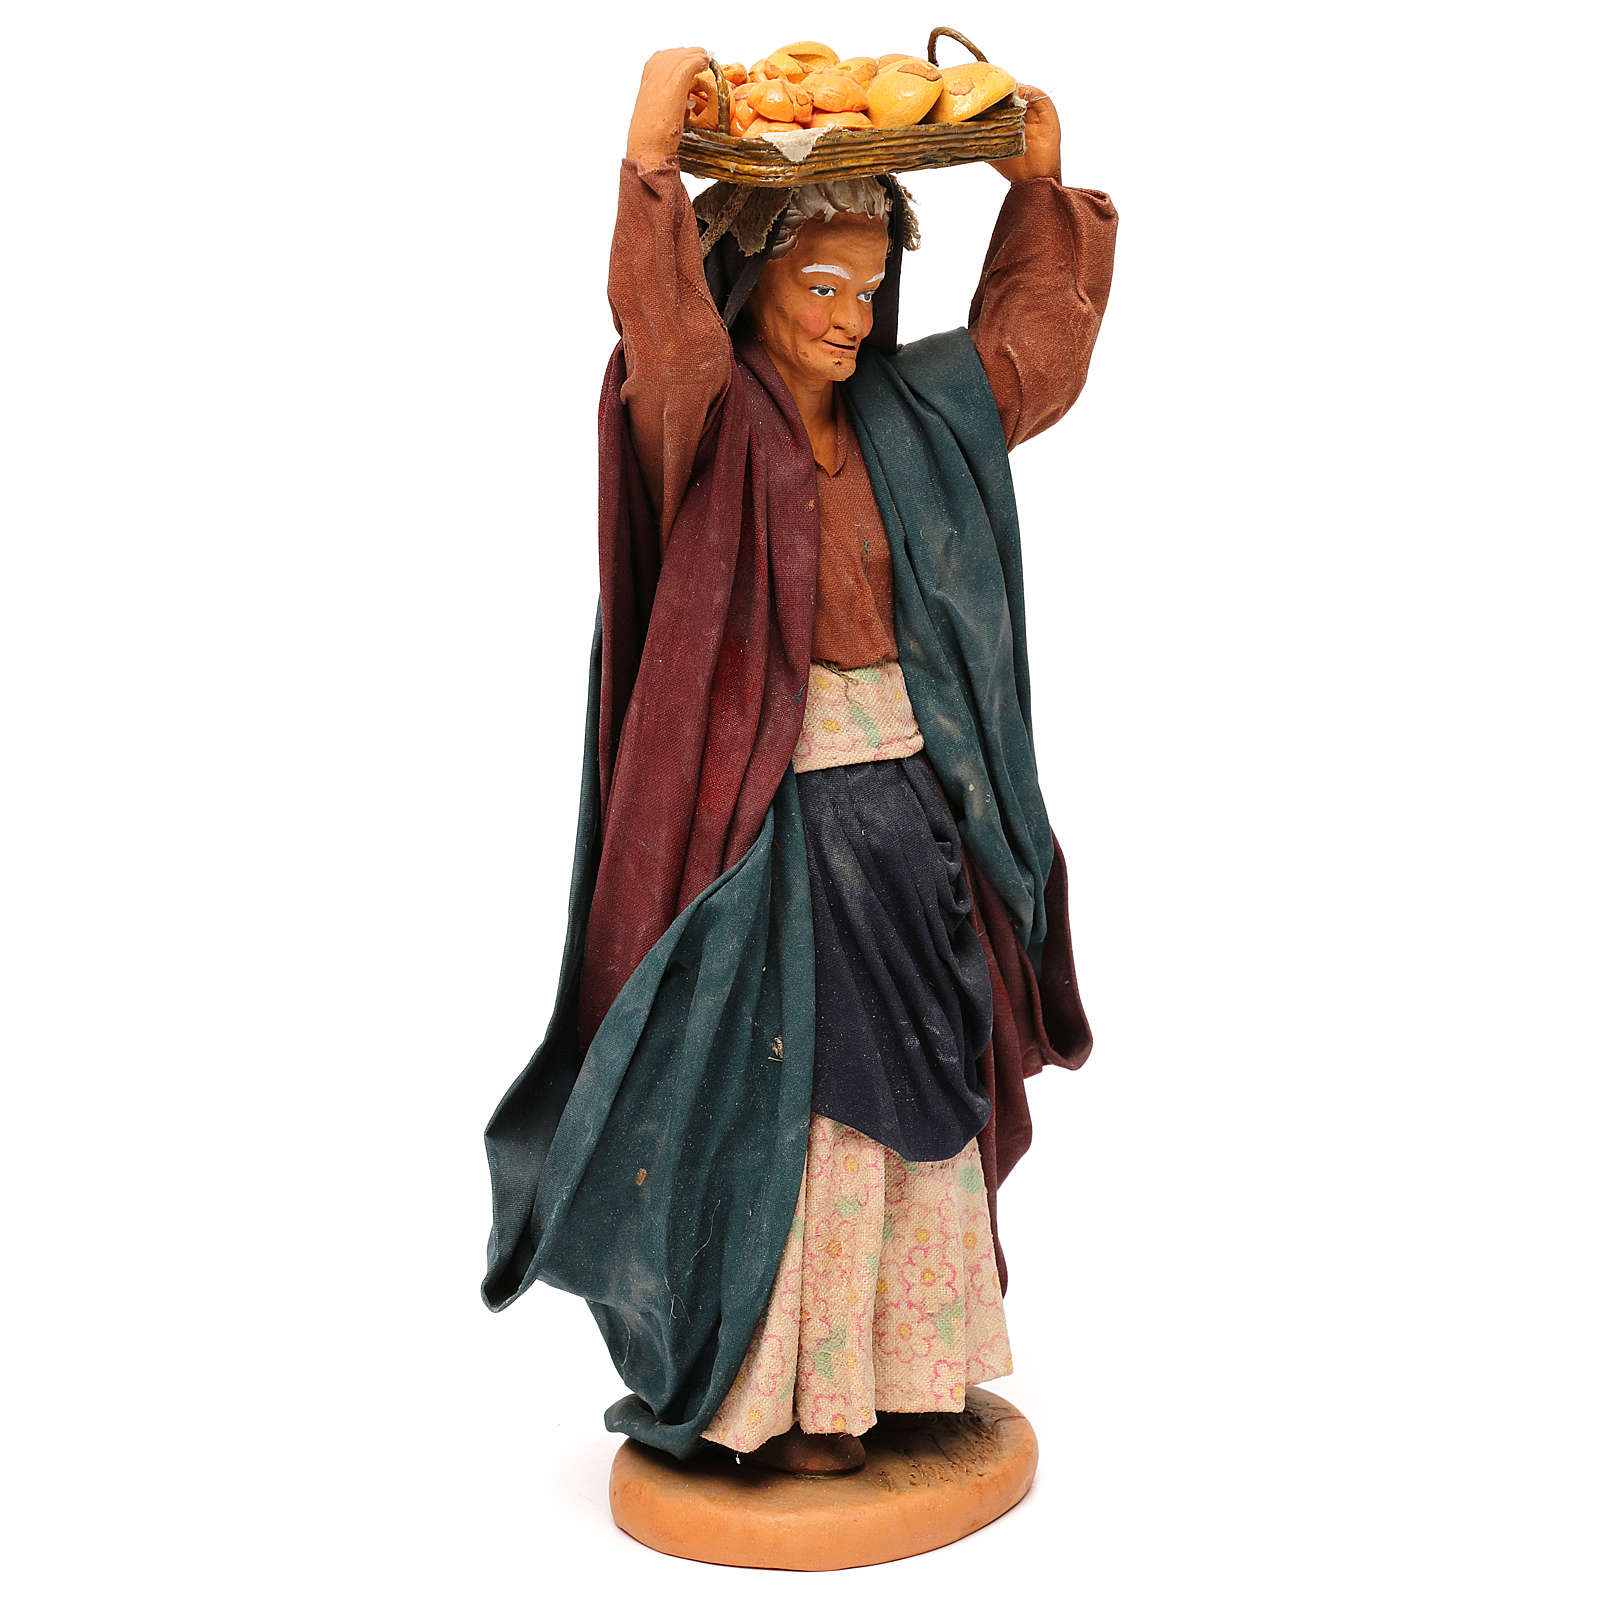 STOCK Woman carrying basket dressed in terracotta, 30 cm Neapolitan nativity 4